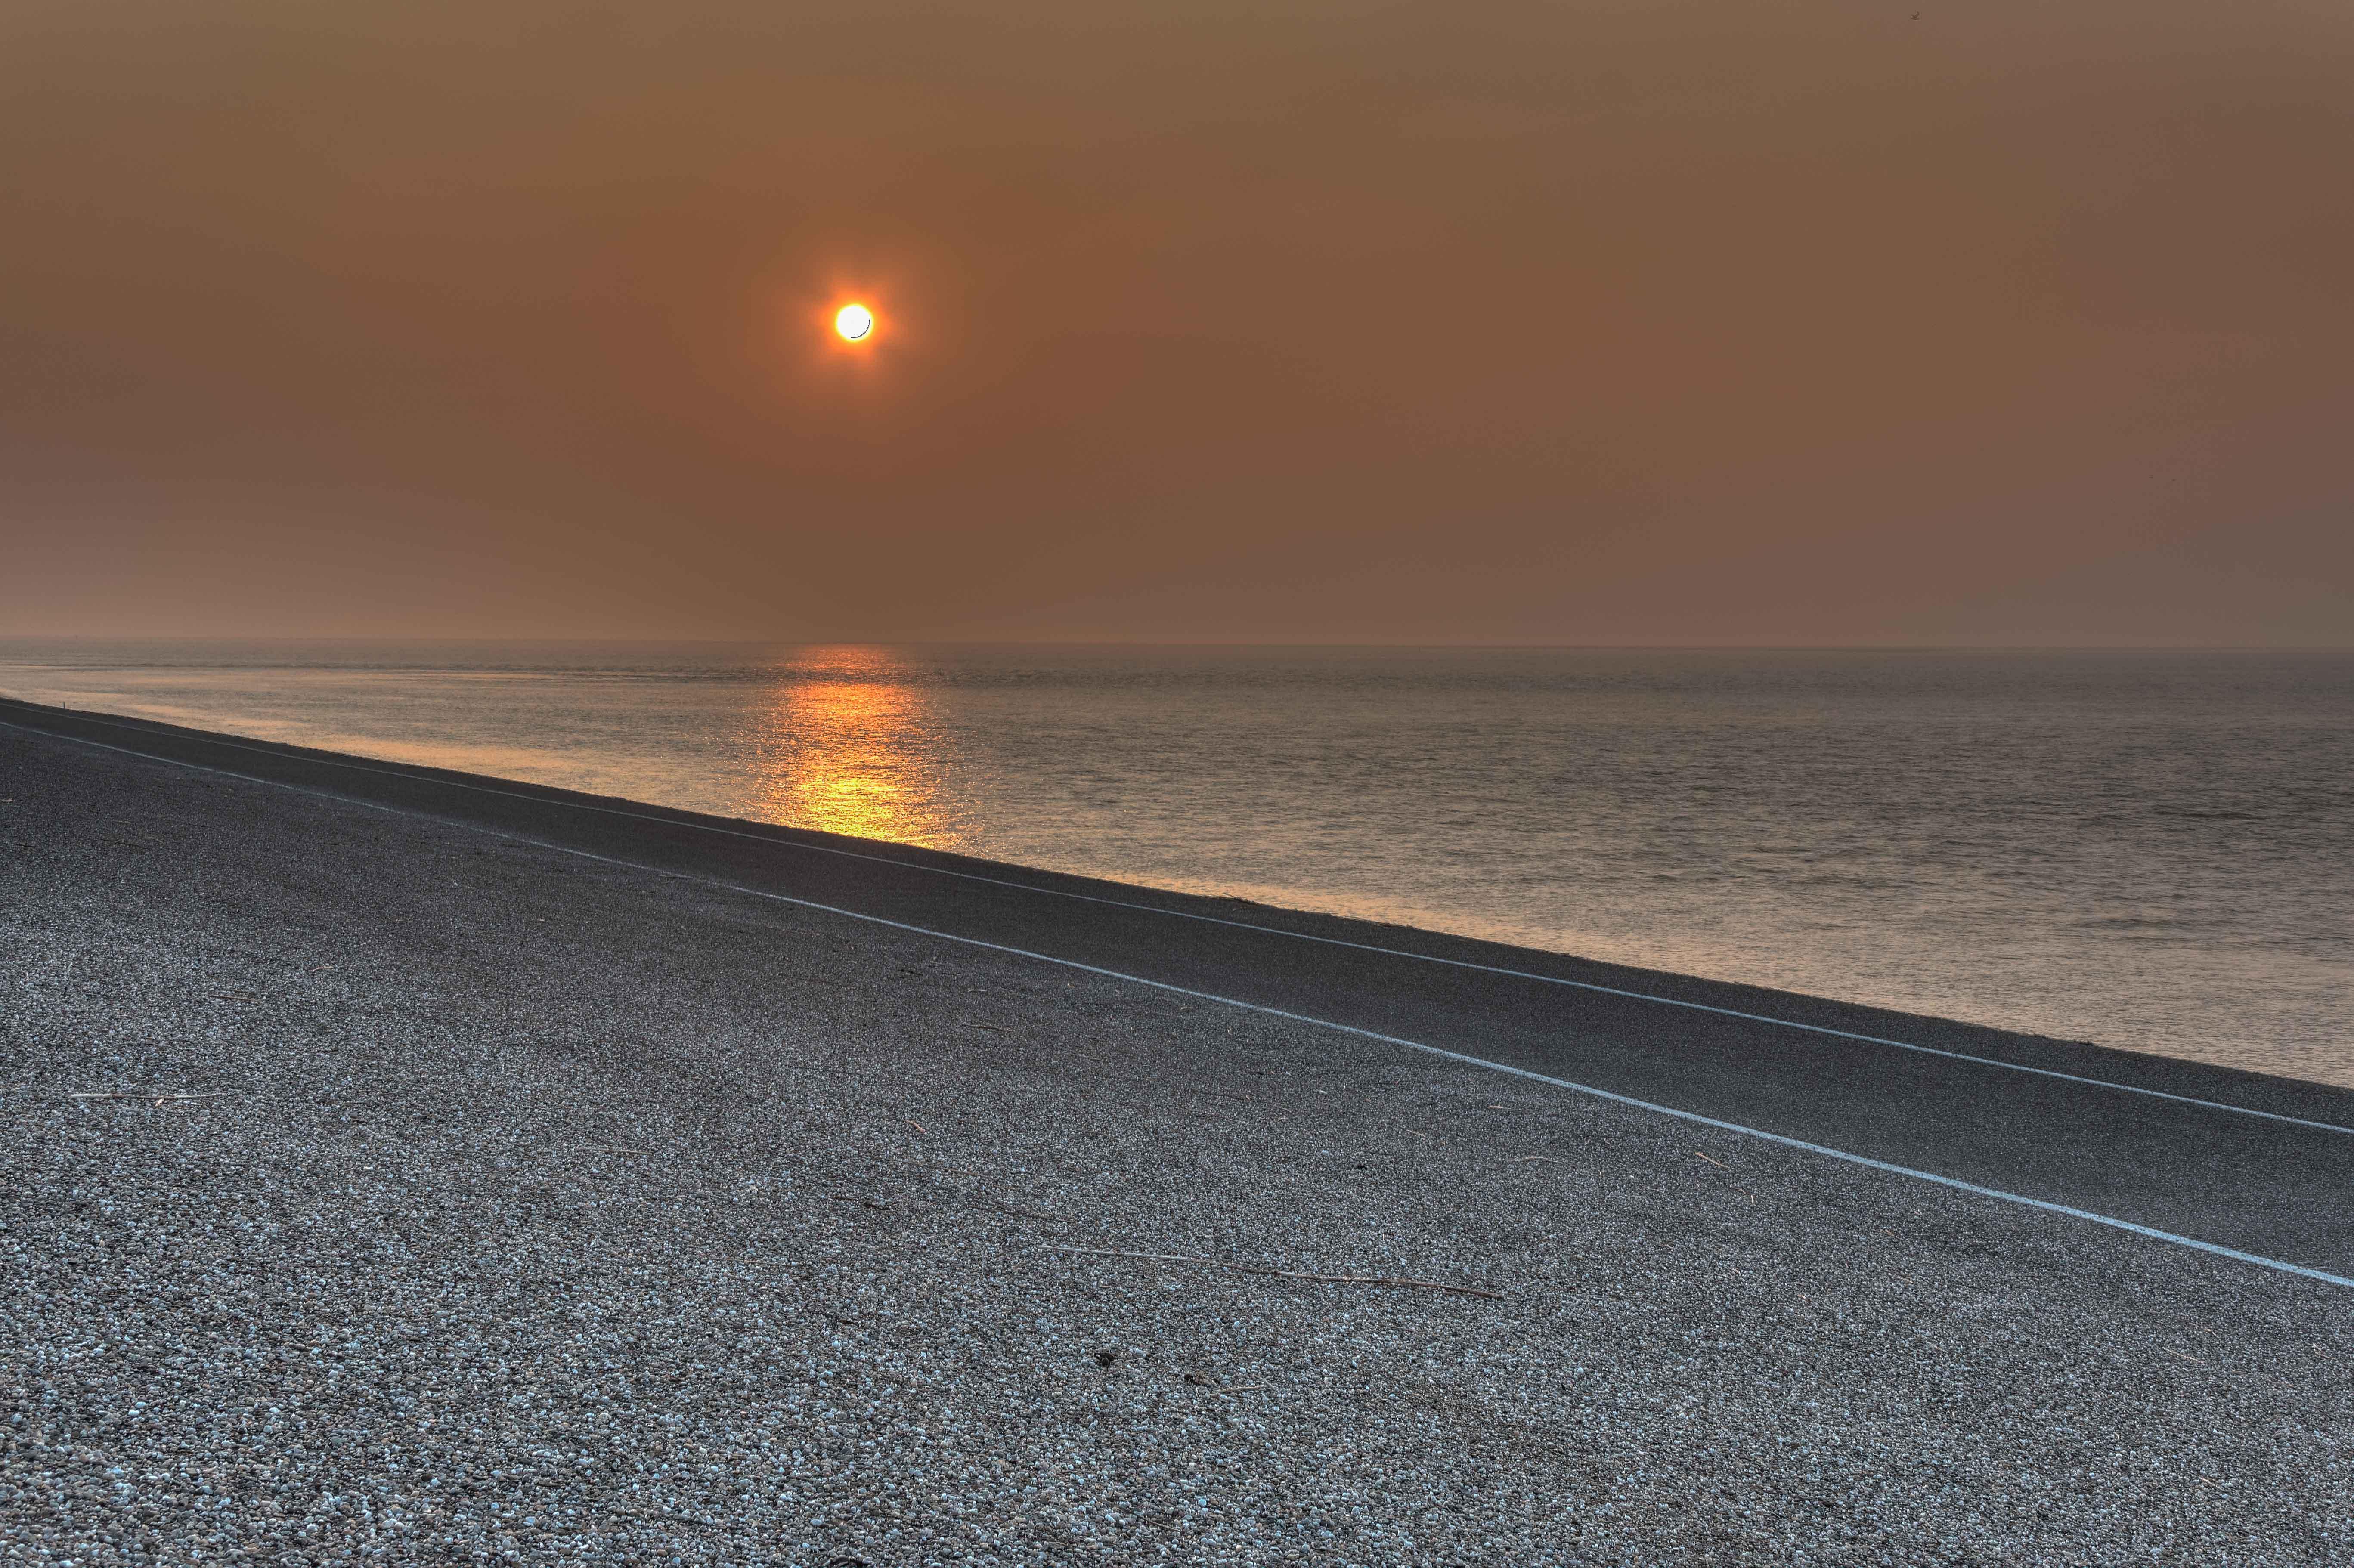 Sunset at Zeepromenade, Beach, HDR, Landscape, Nature, HQ Photo